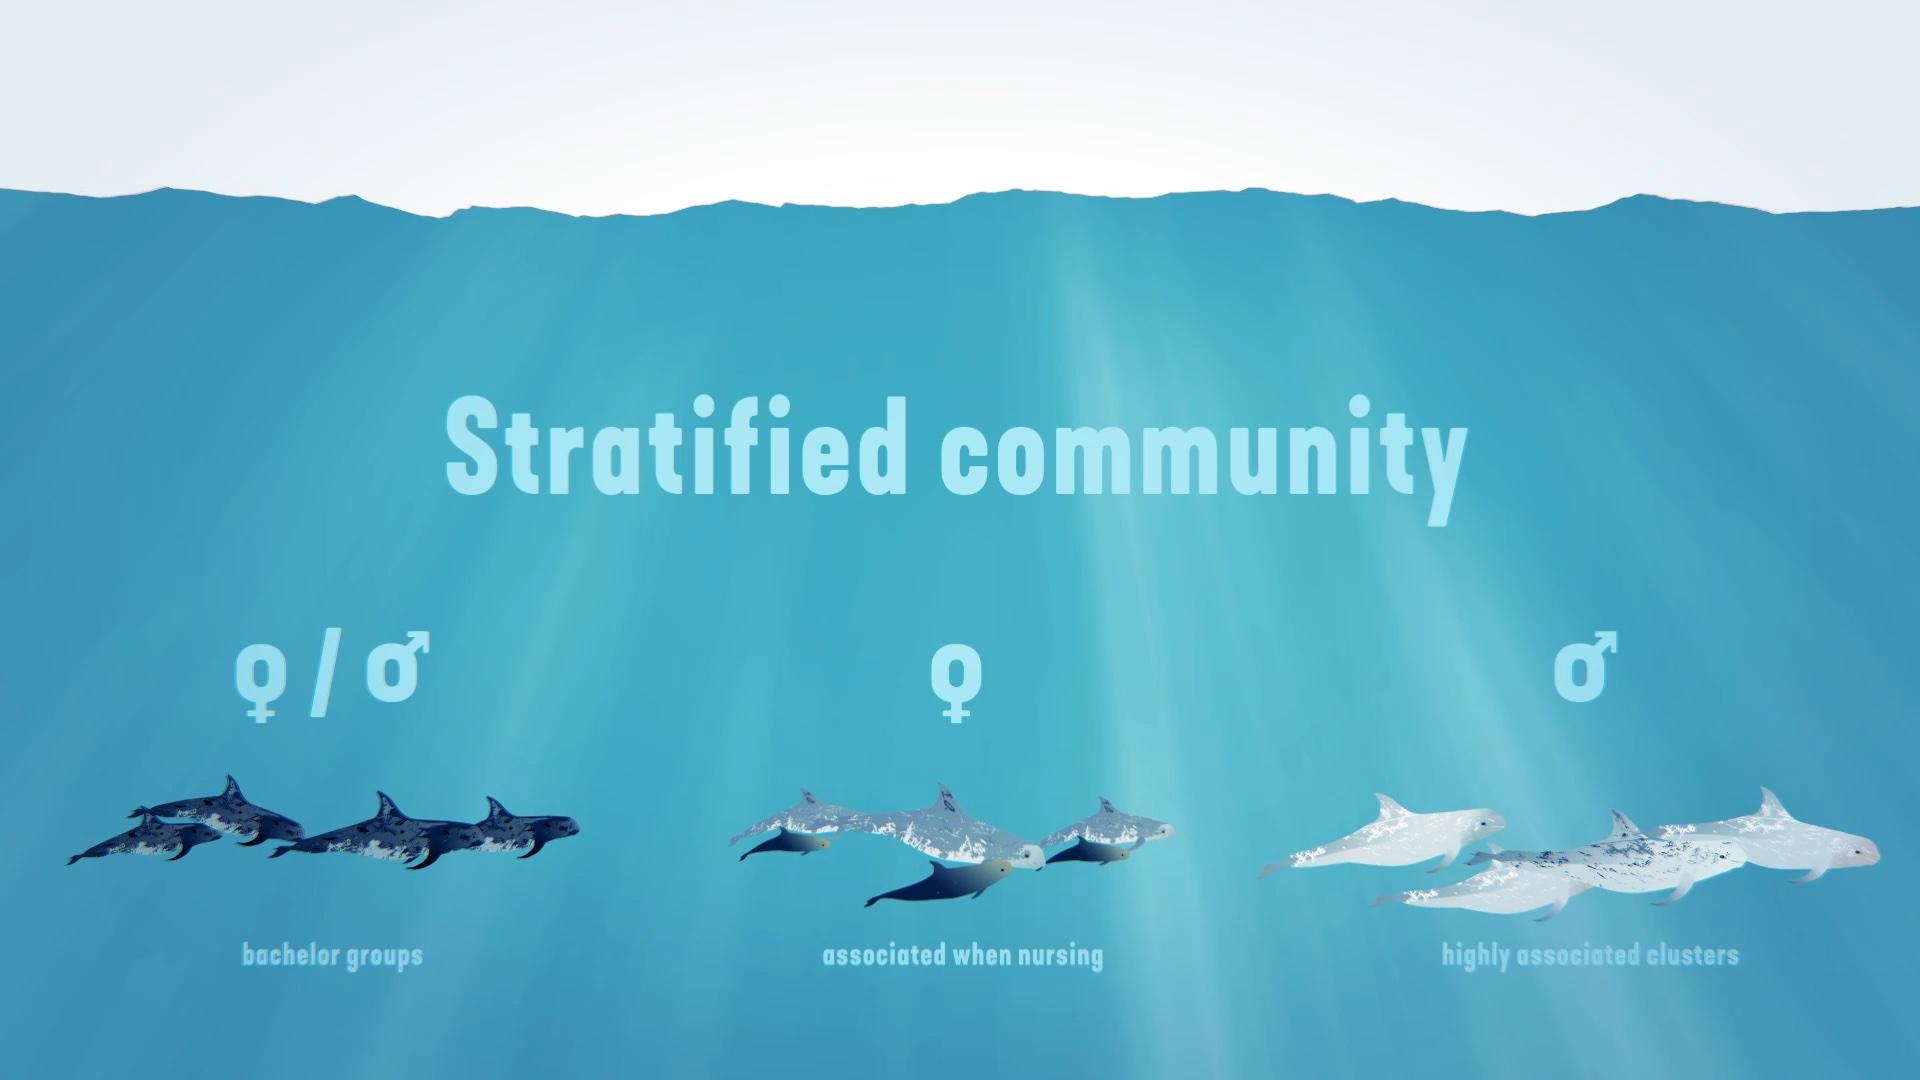 Stratified communtity